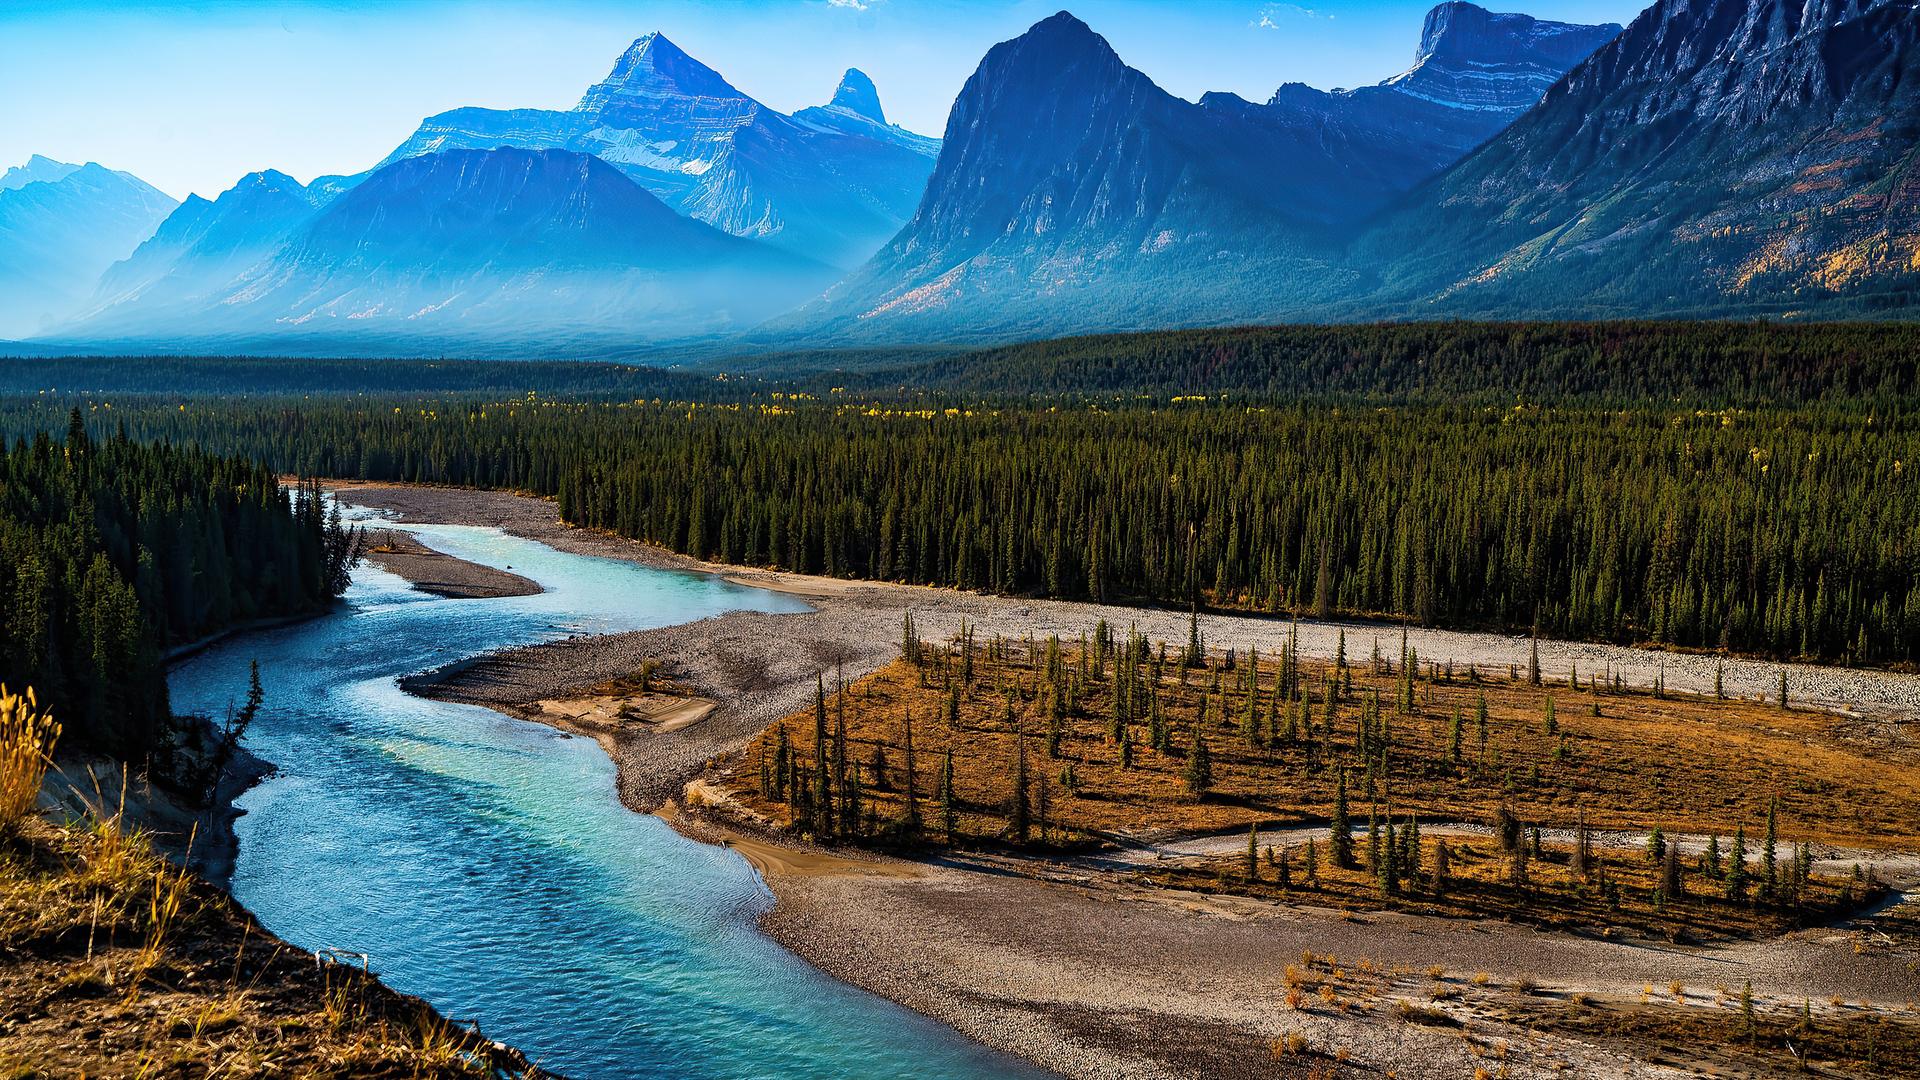 1920x1080 Forest Landscape Mountain Nature River Scenic 4k ...